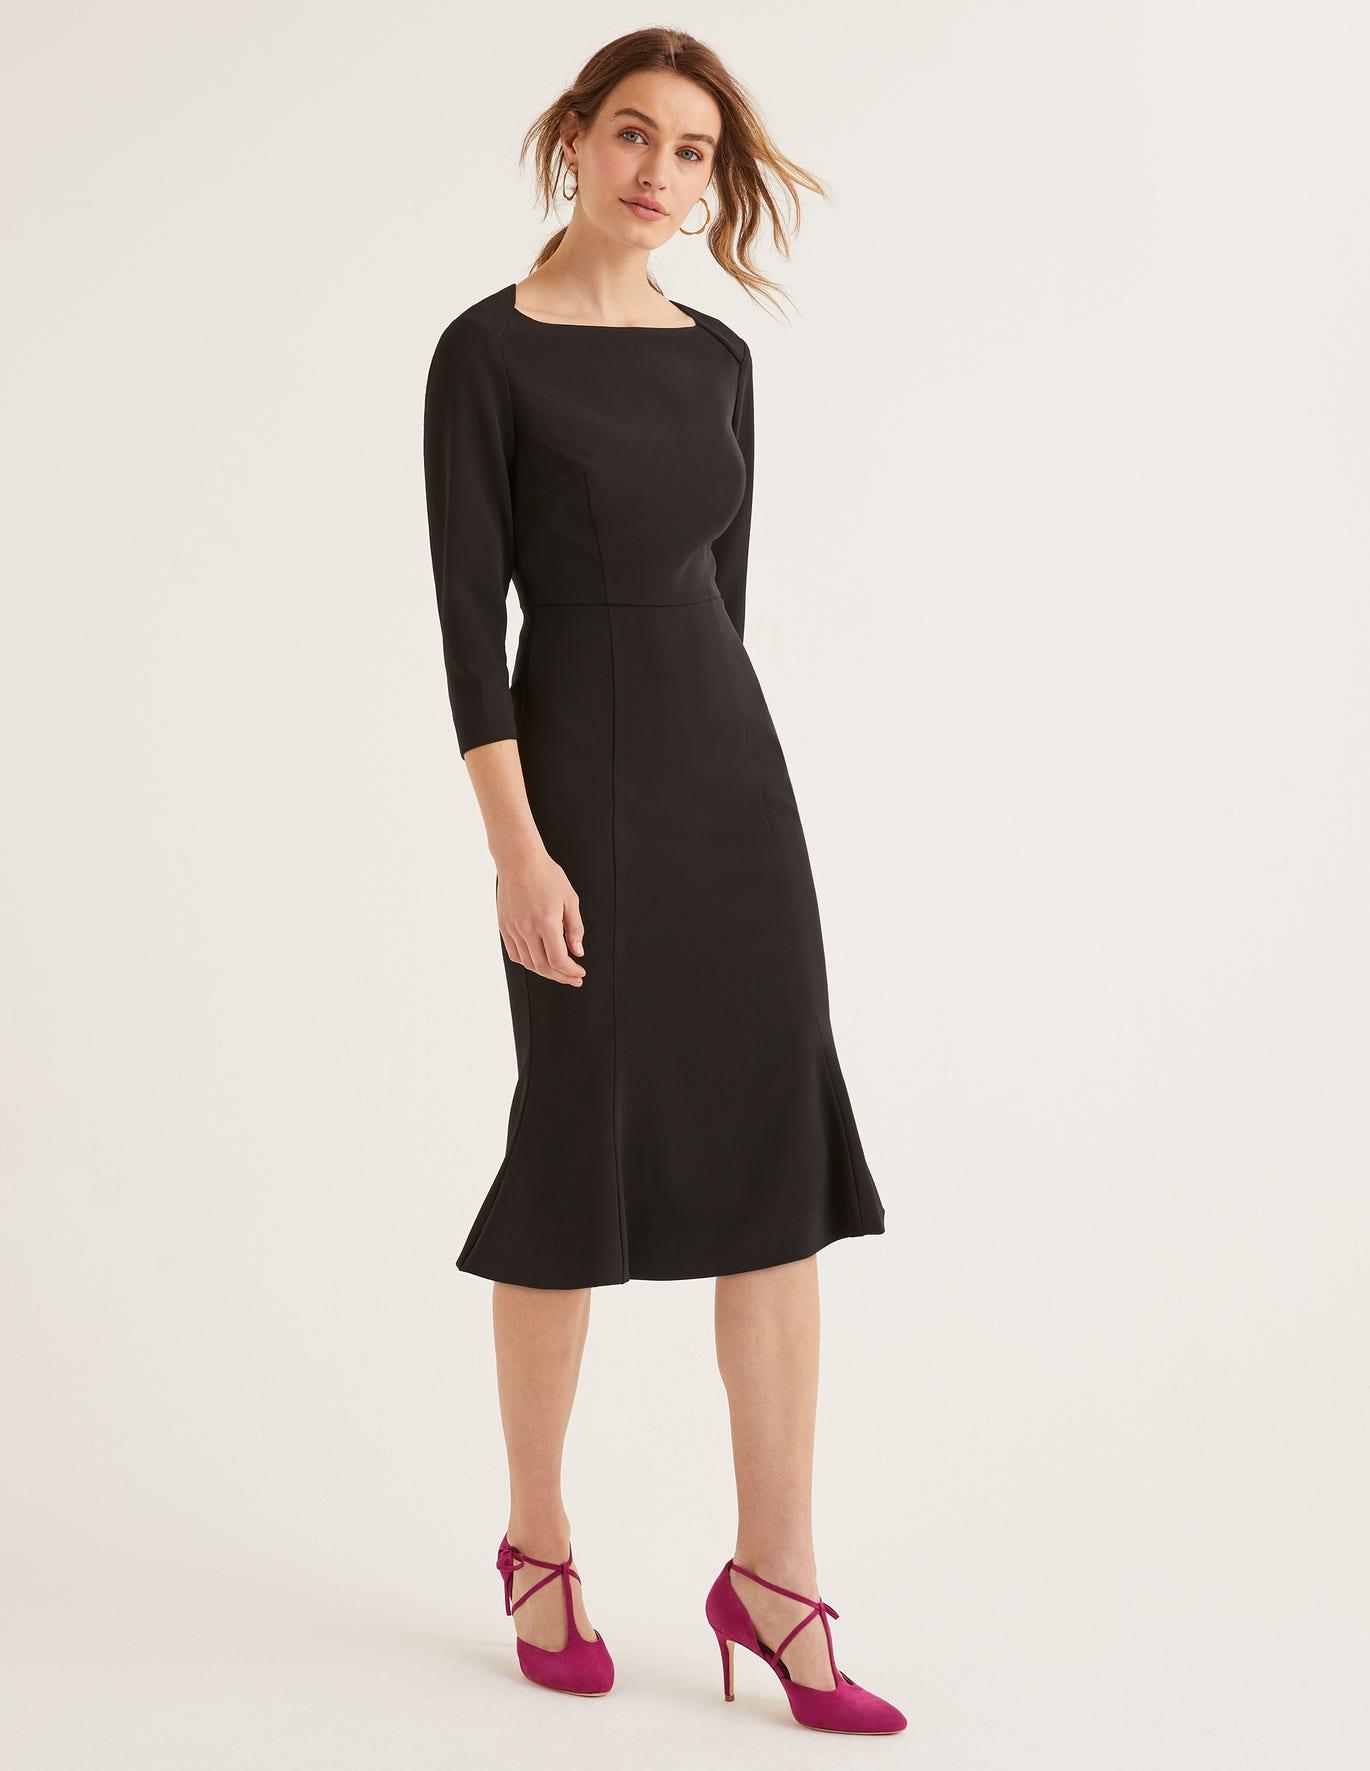 Violette Dress by Boden